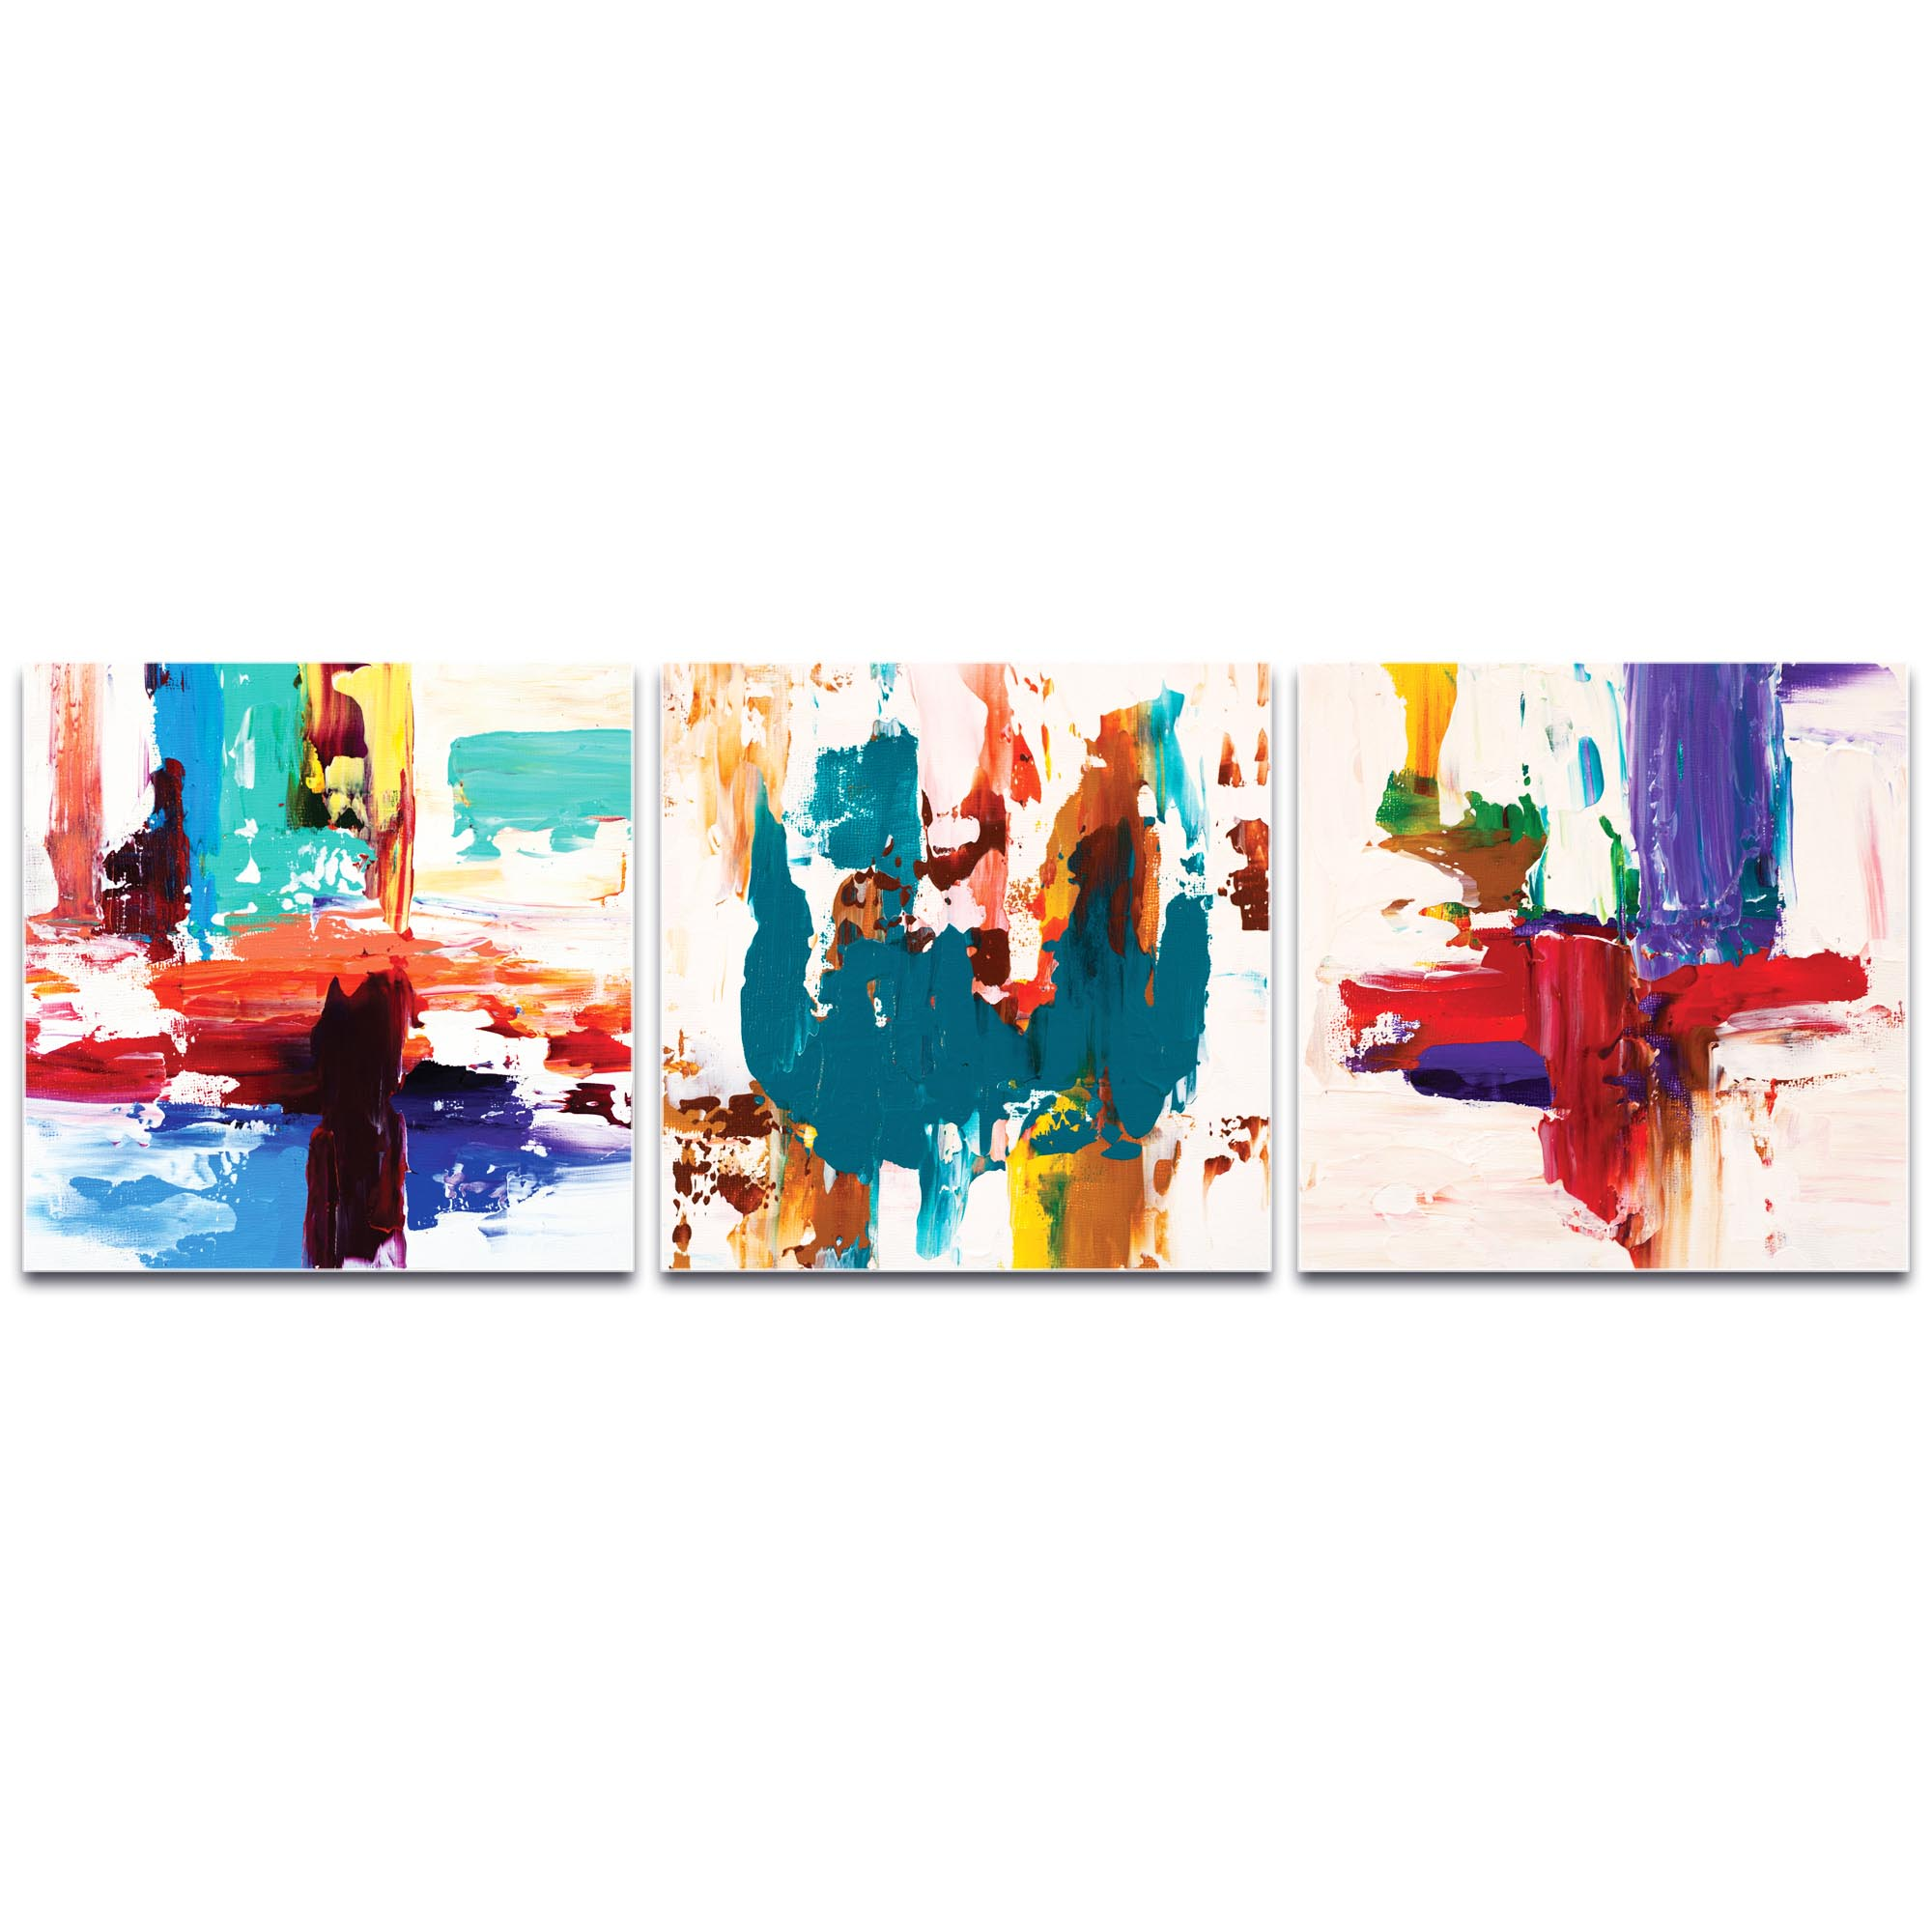 Abstract Wall Art 'Urban Triptych 2' - Urban Decor on Metal or Plexiglass - Image 2